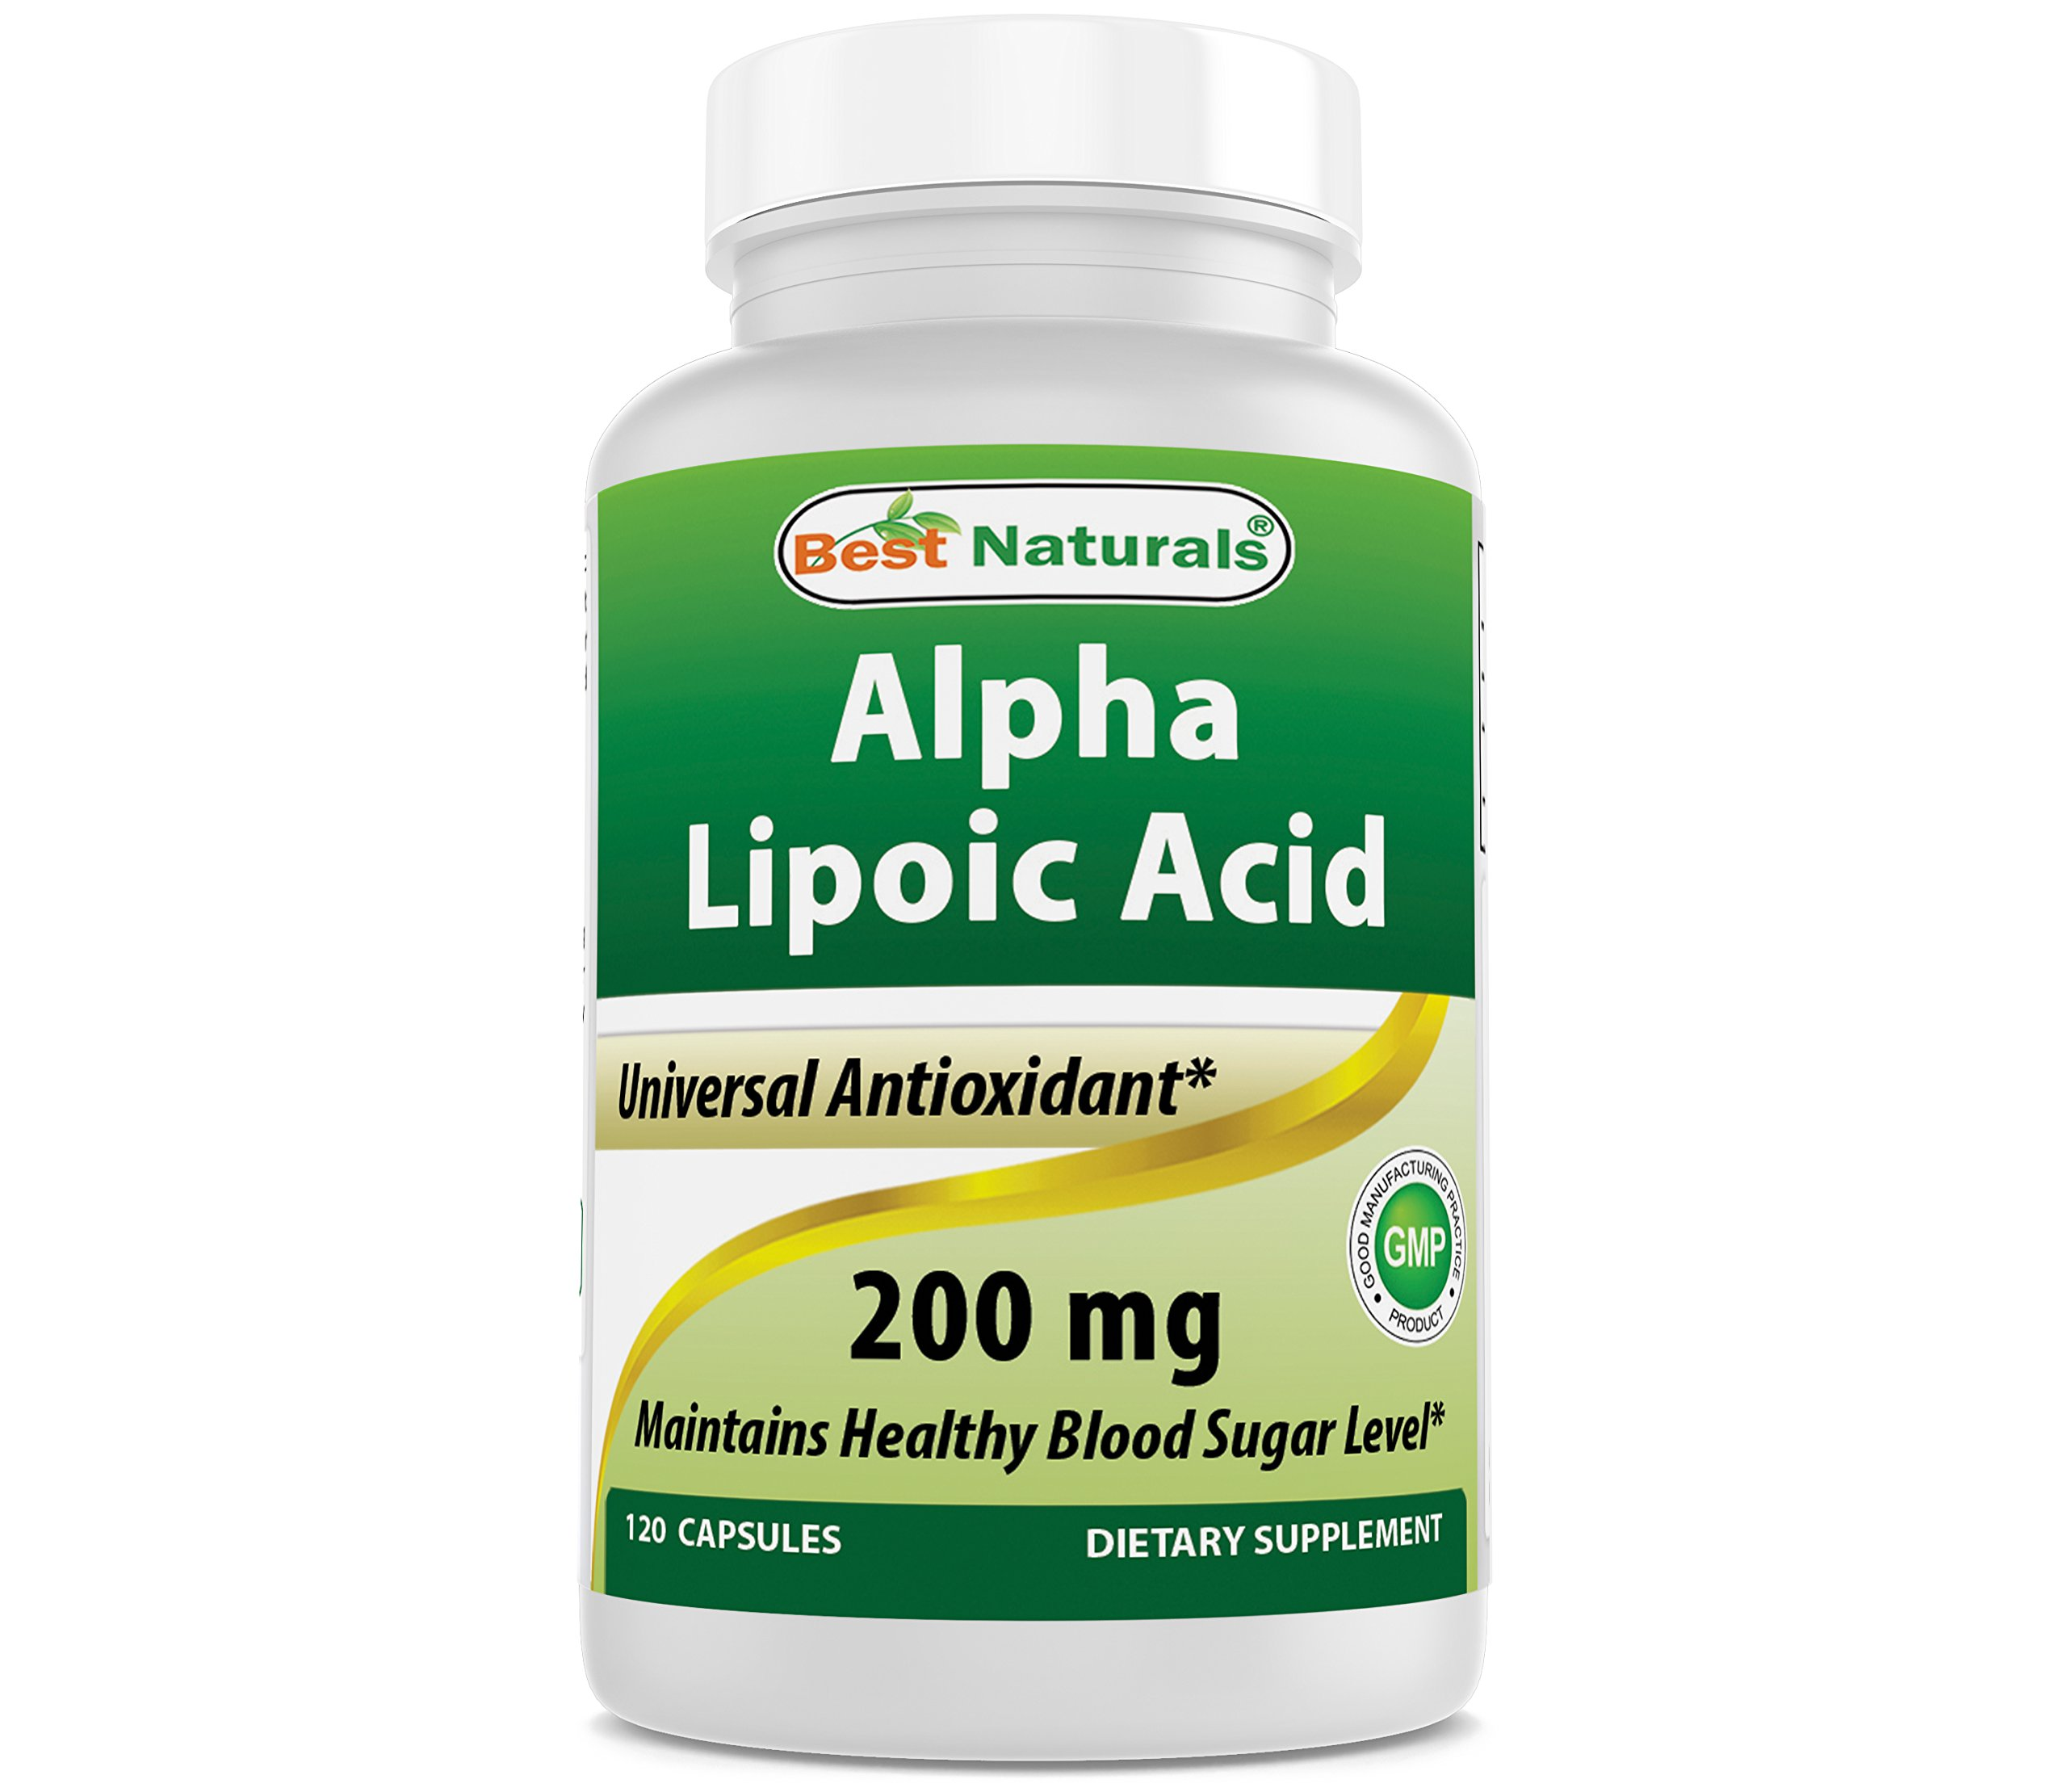 Best Naturals Alpha Lipoic Acid 200 Mg 120 Capsules